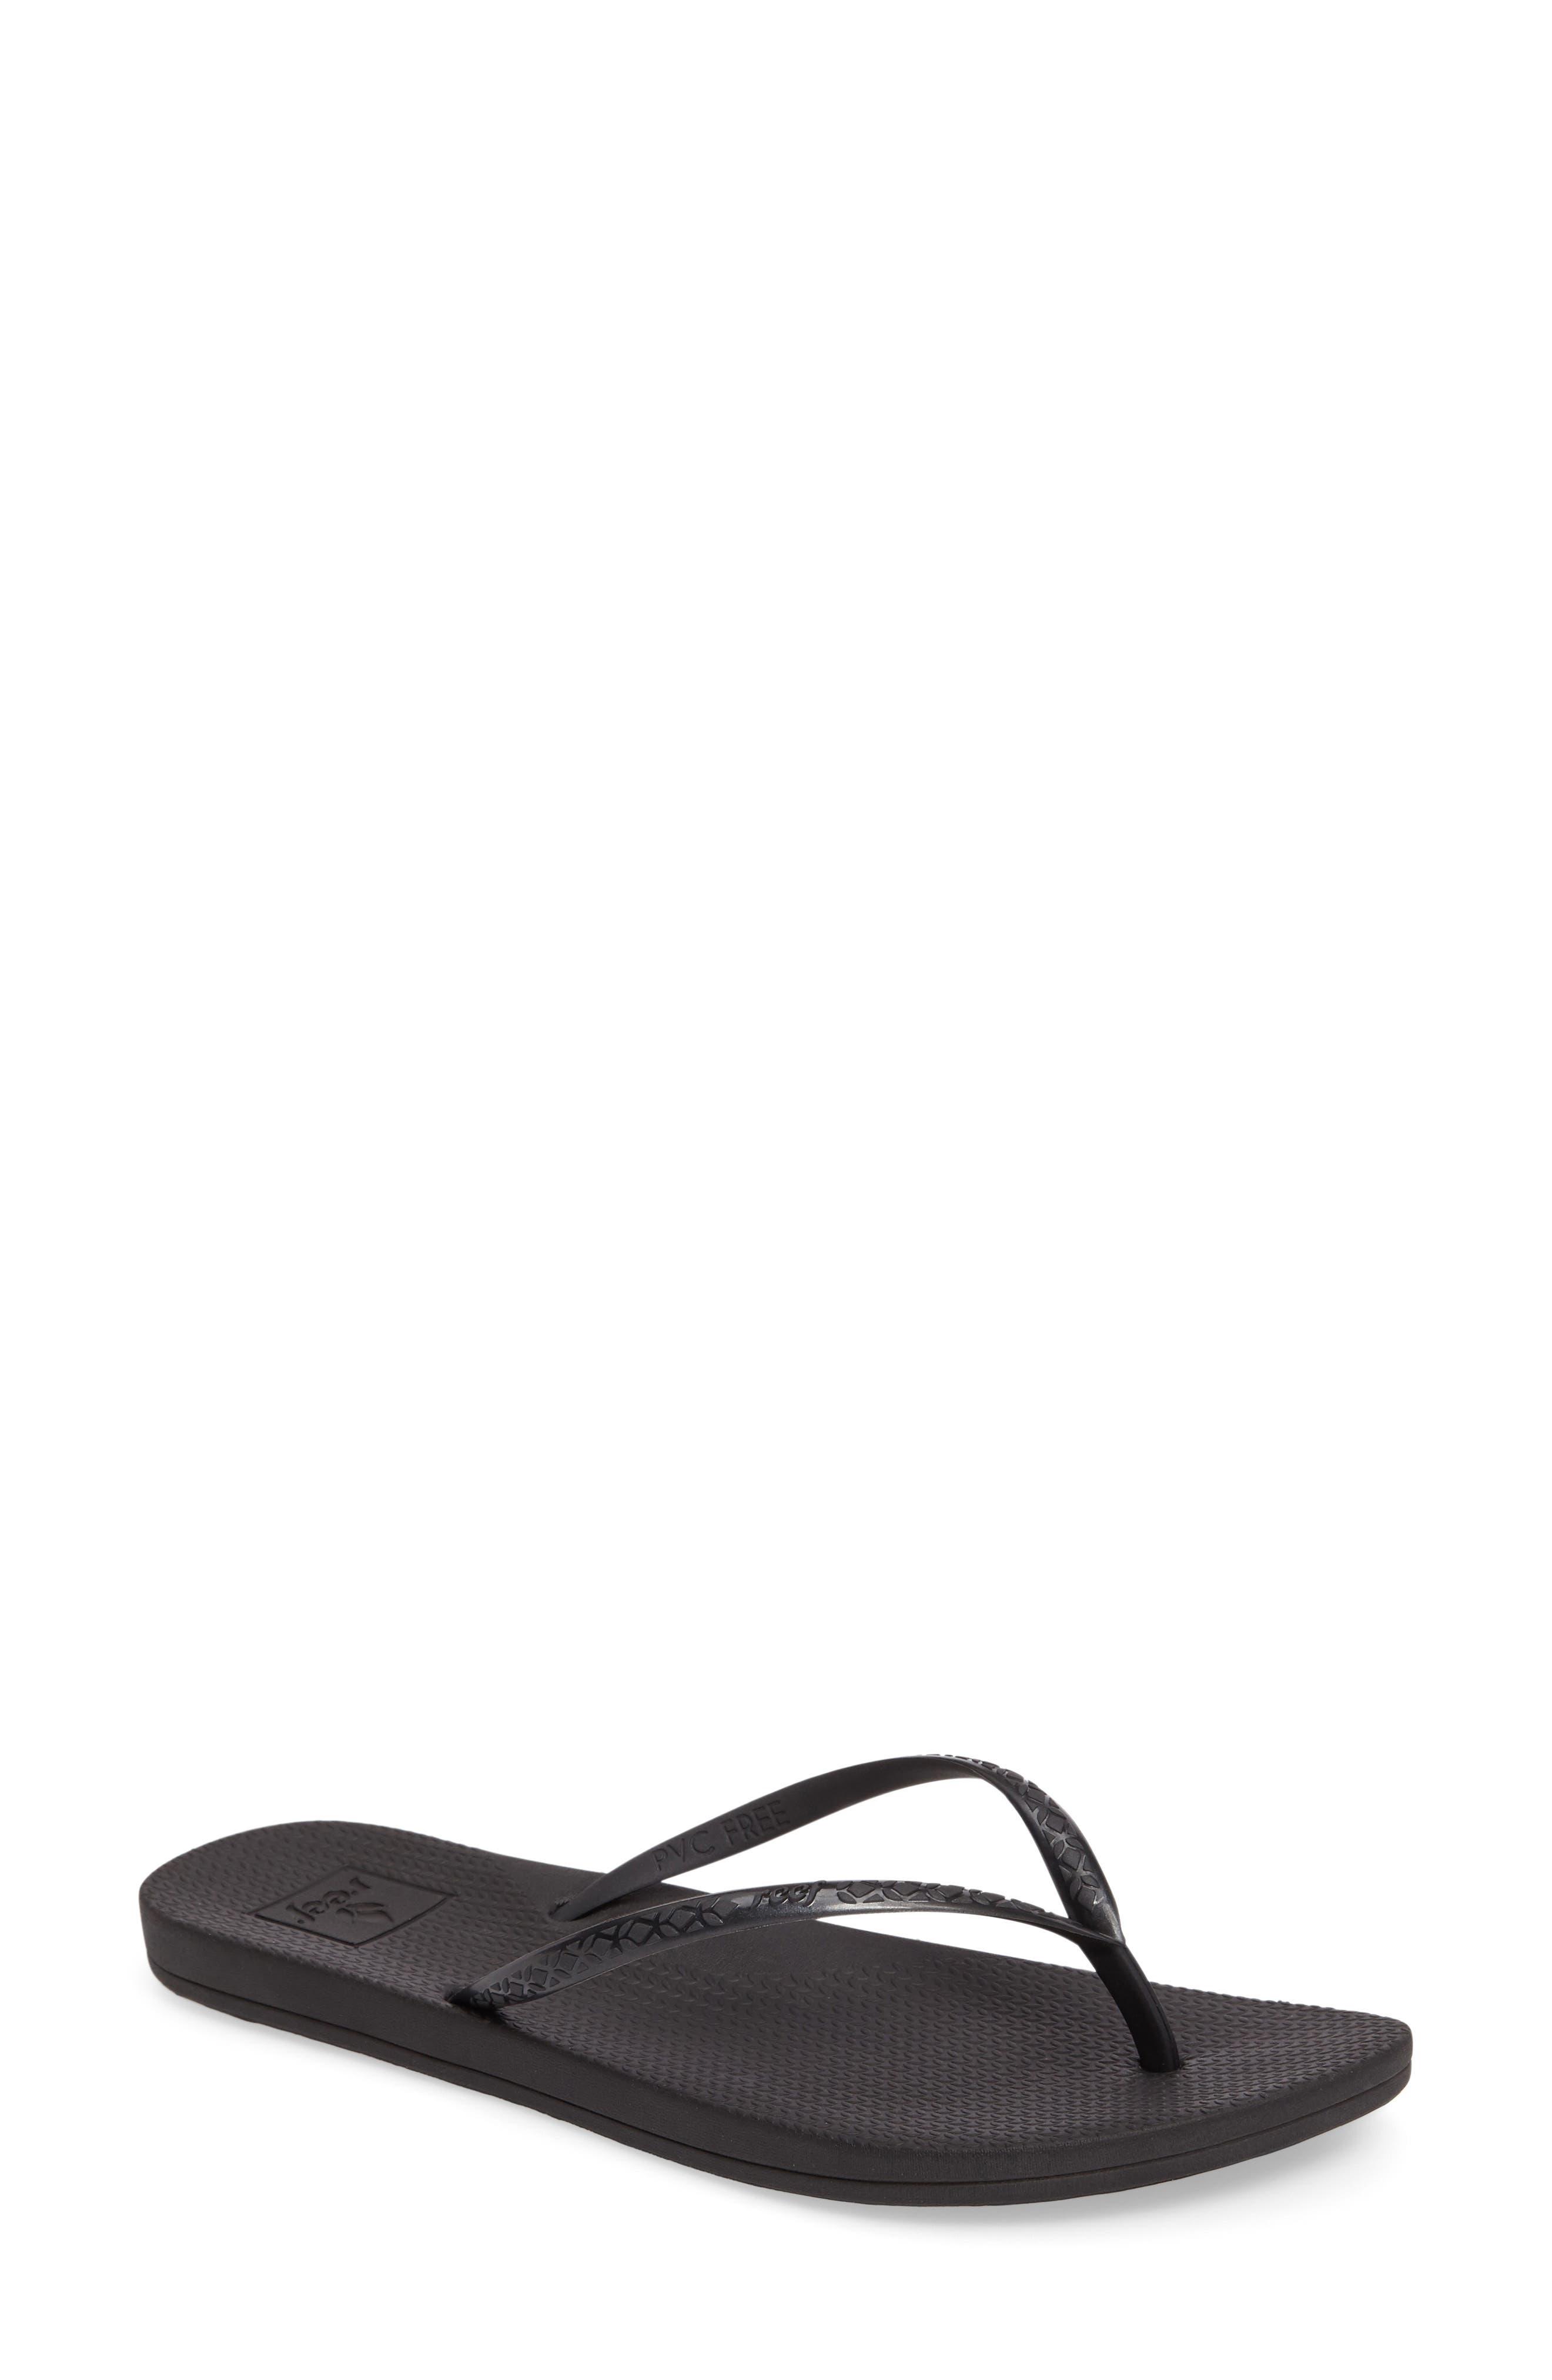 REEF Escape Lux Flip Flop in Black